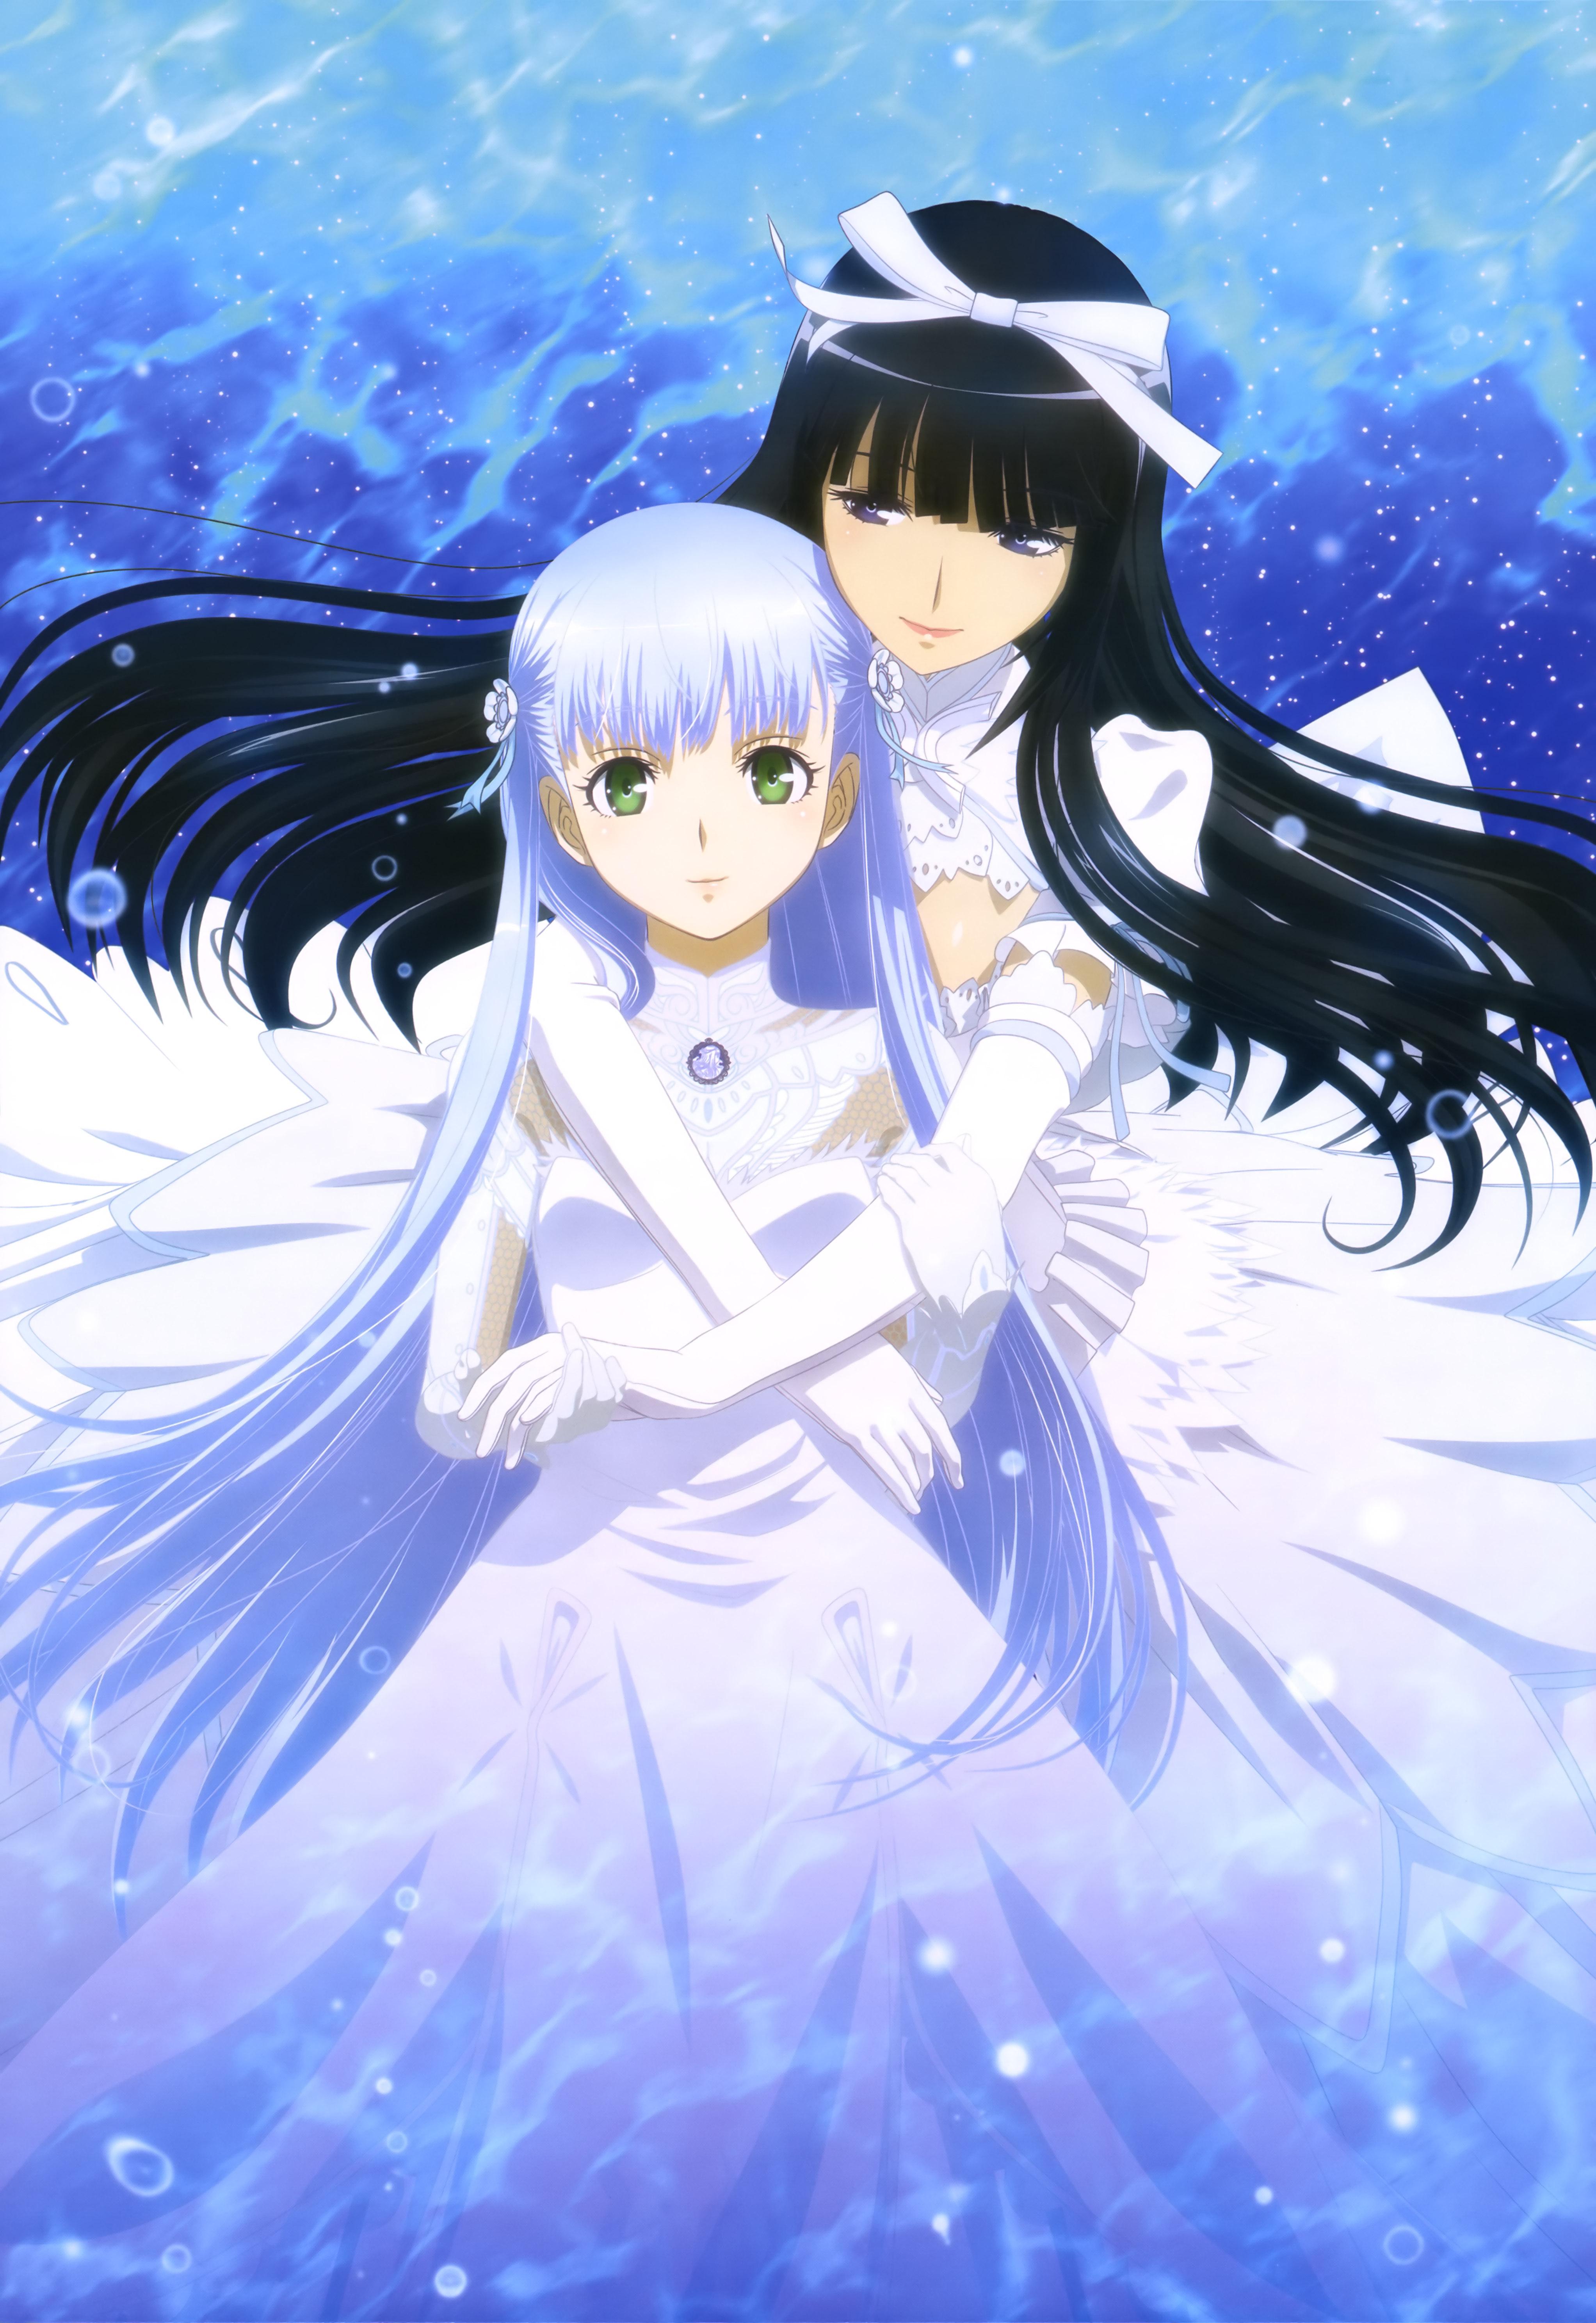 Aoki Hagane No Arpeggio Arpeggio Of Blue Steel Zerochan Anime